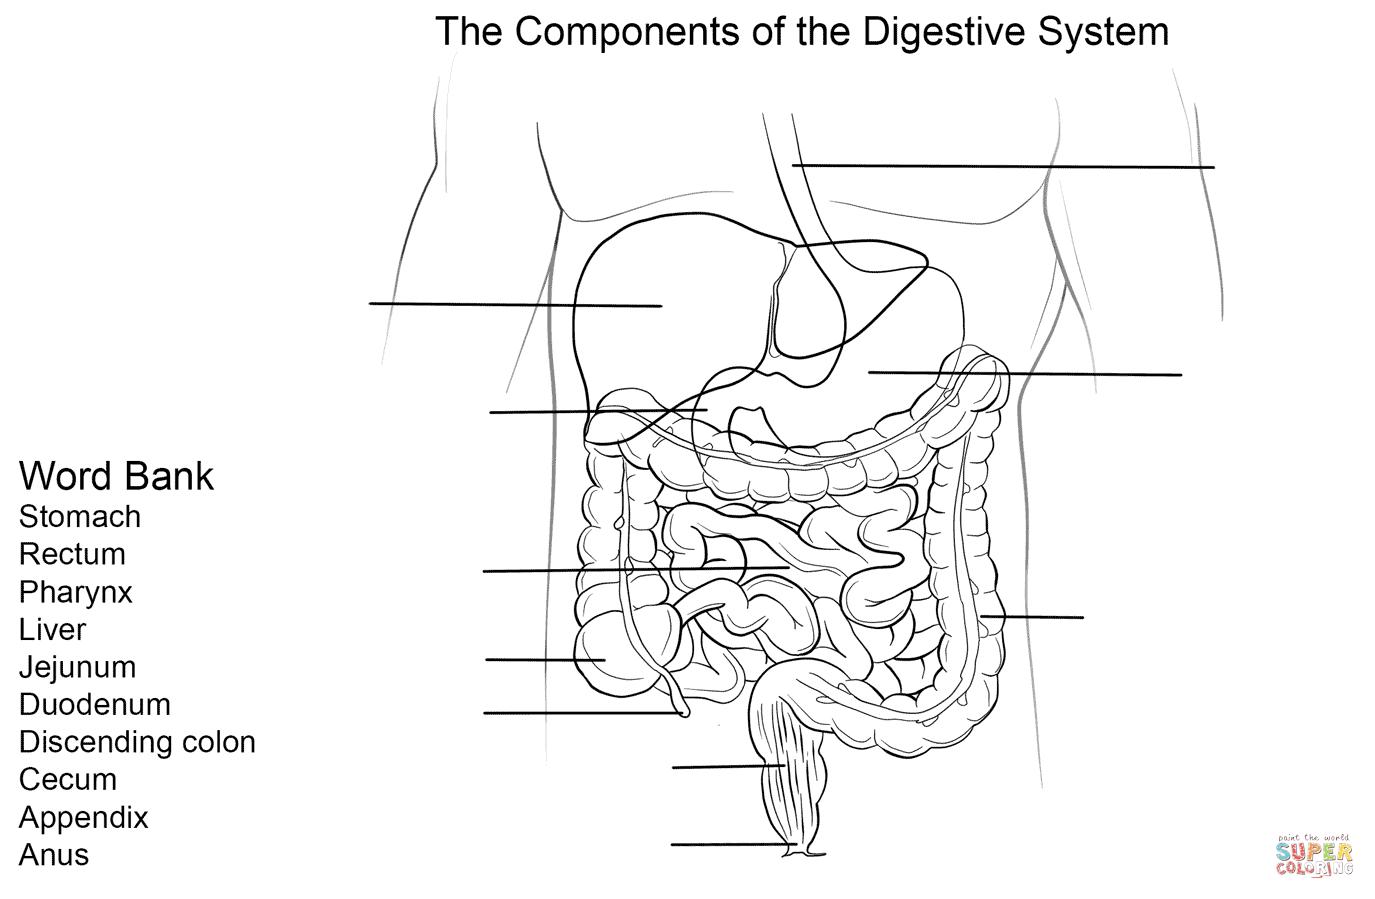 4th grade digestive system diagram 3 phase kwh meter wiring worksheet coloring page free printable